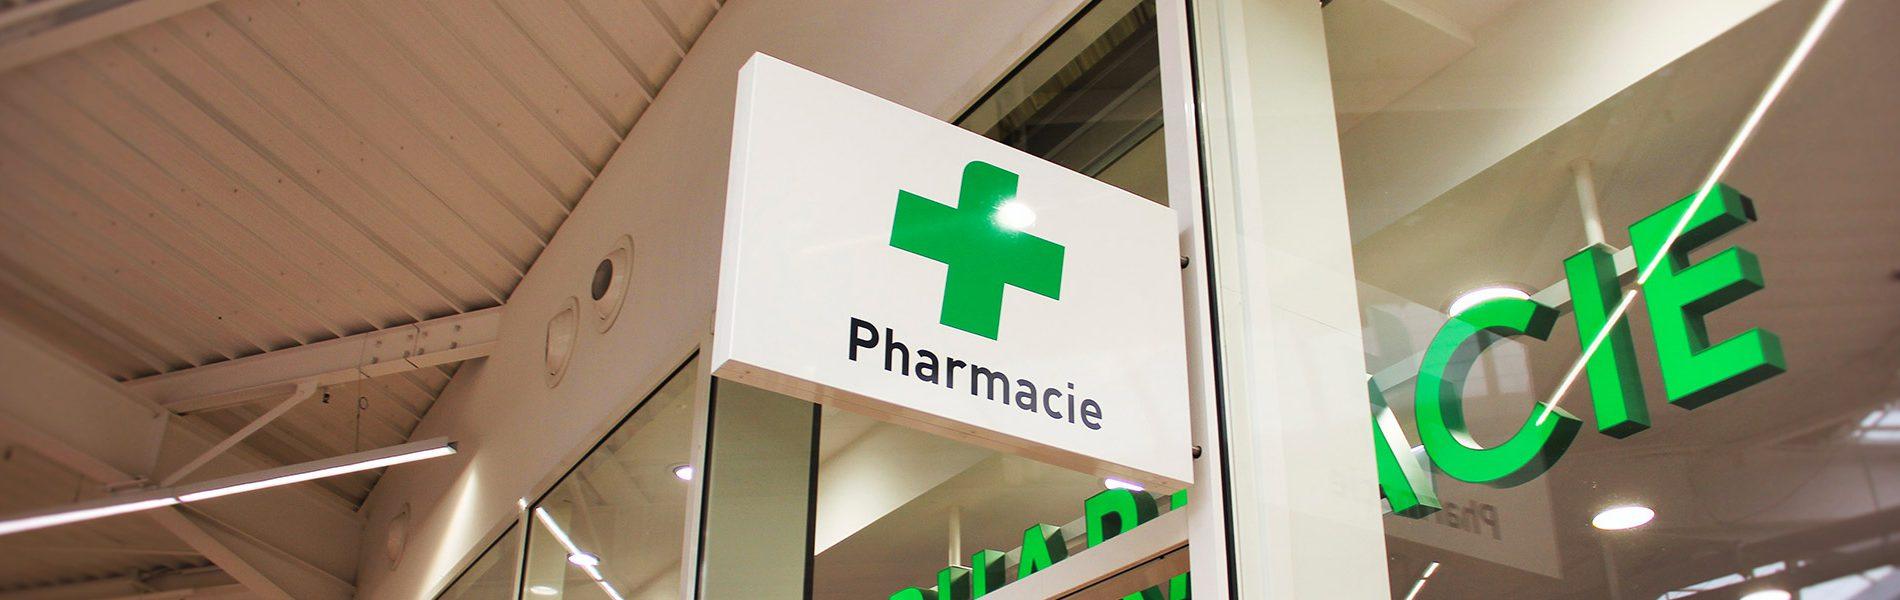 Pharmacie DES COQUELICOTS - Image Homepage 2